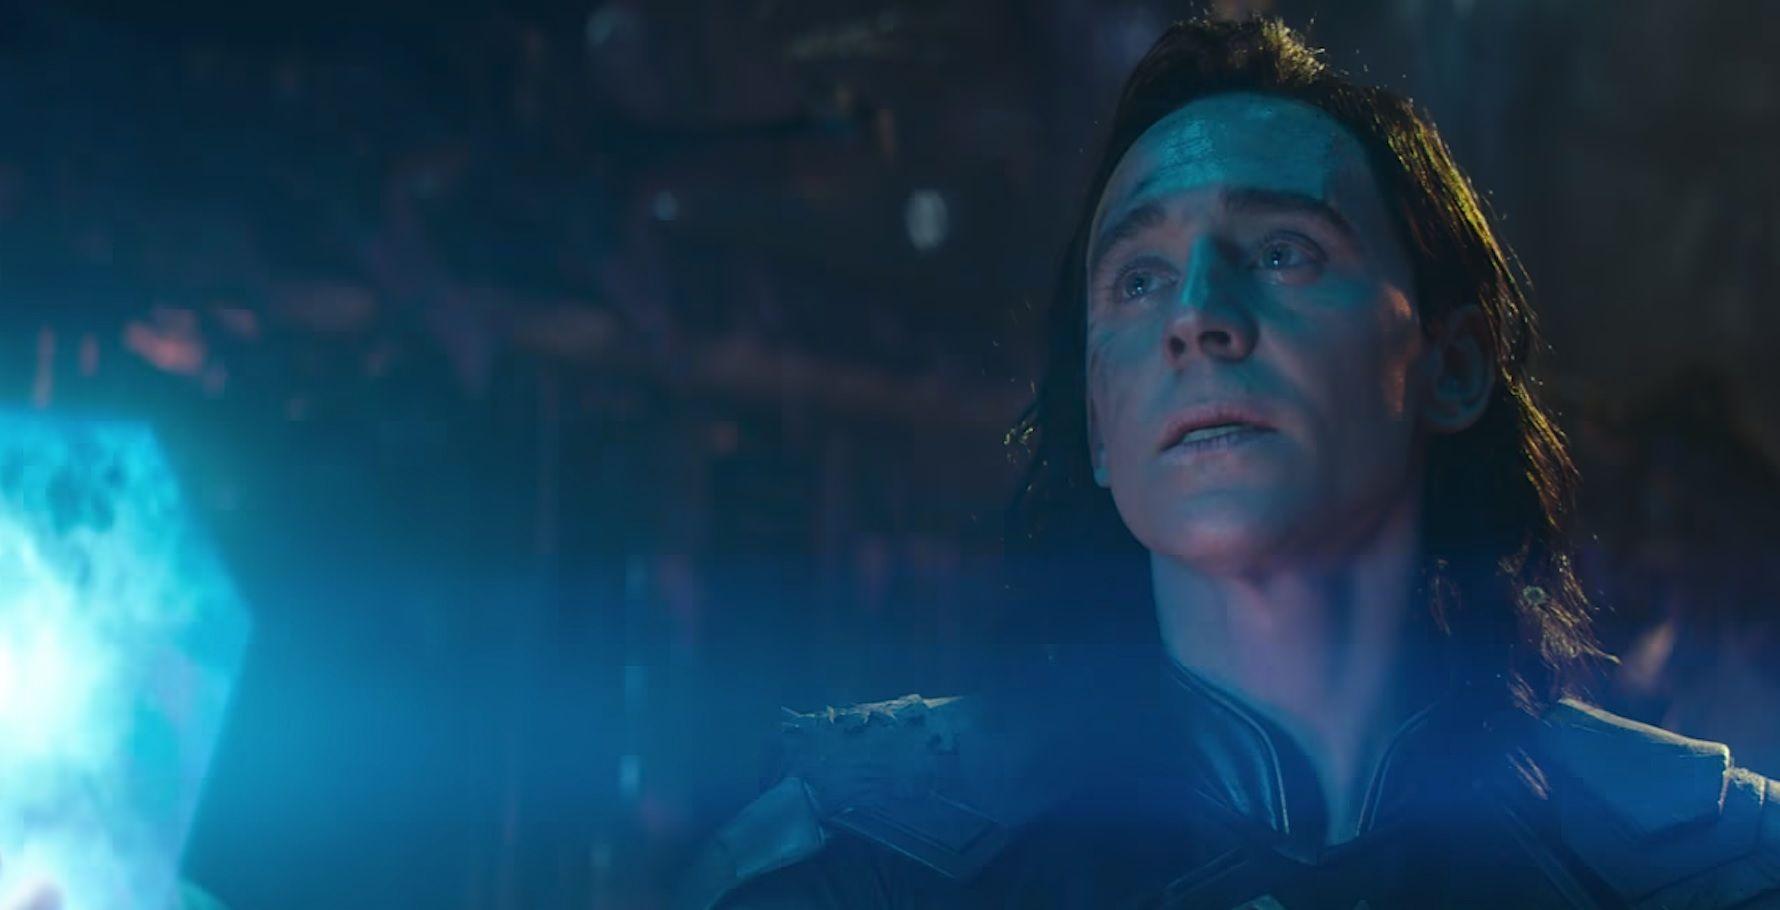 Avengers: Endgame - 10 Ways Loki Might Actually Come Back | CBR